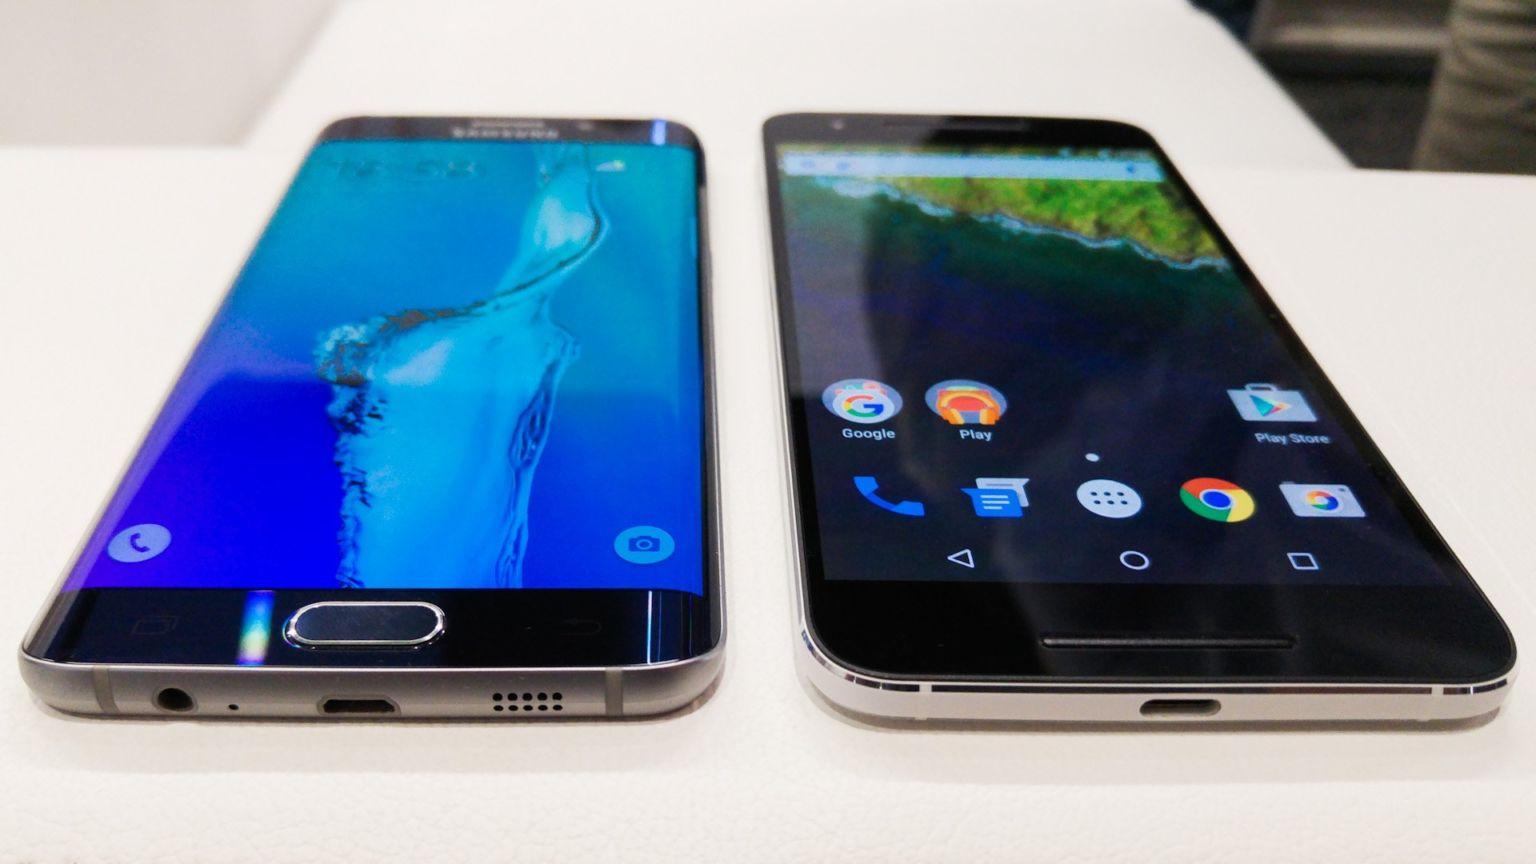 Nexus 6P vs Samsung Galaxy S7 Edge